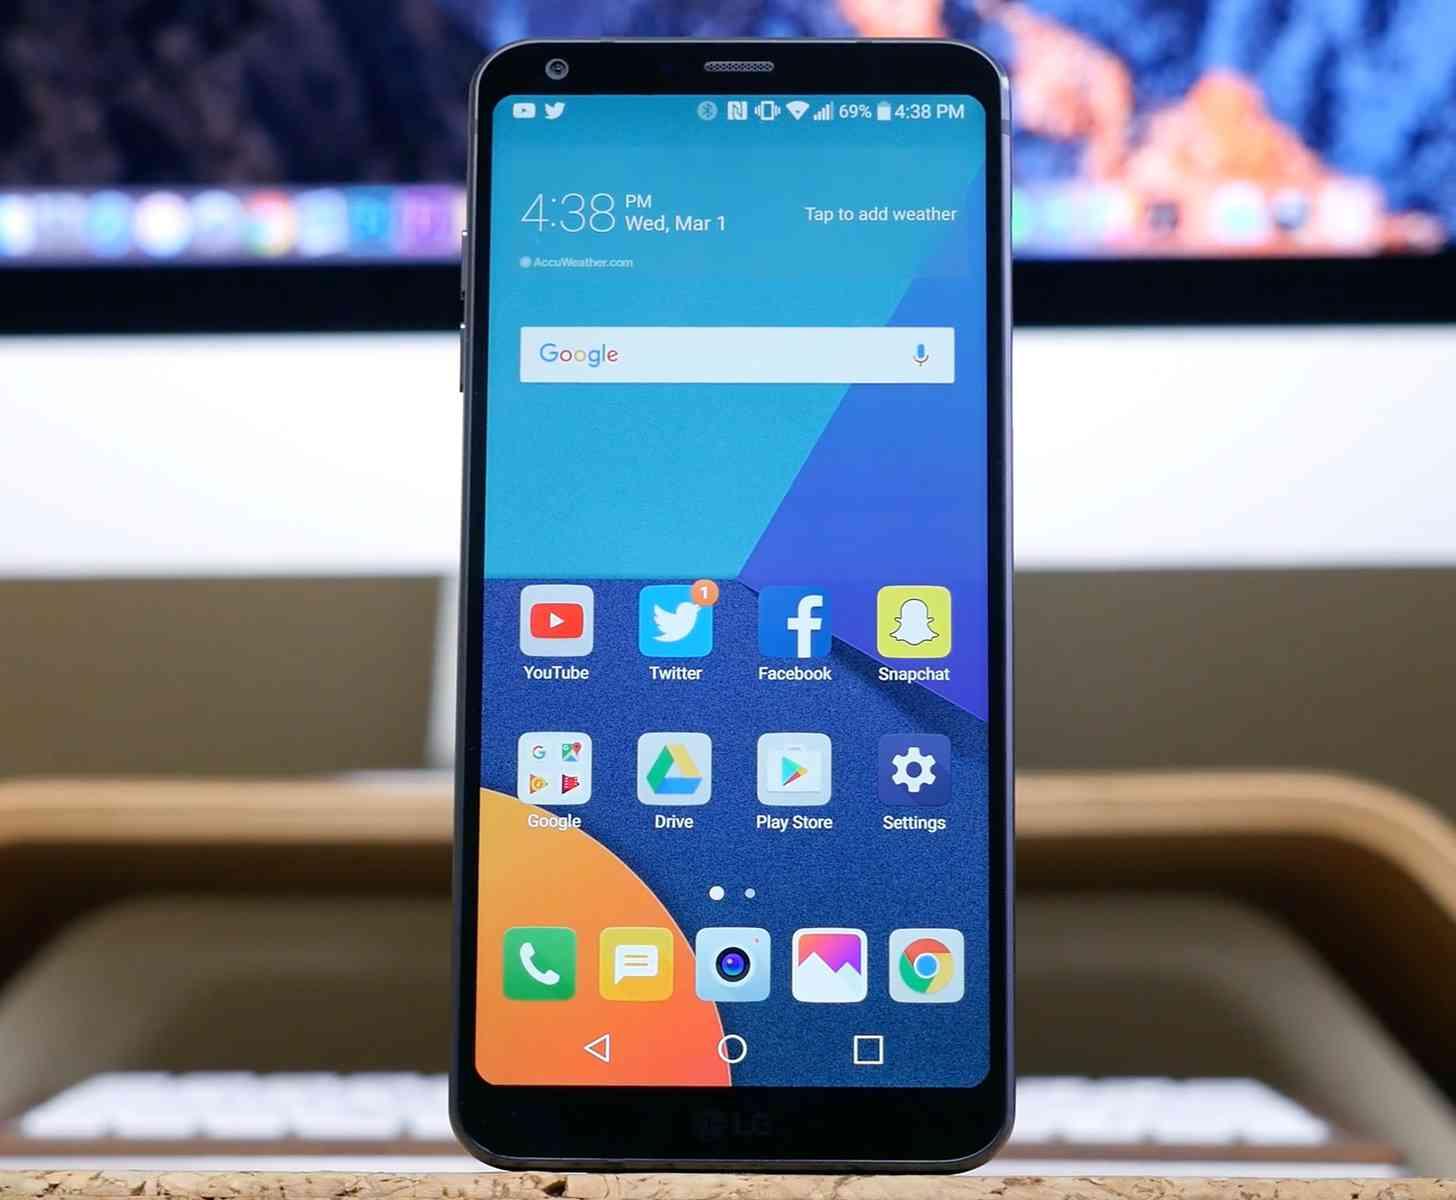 Unlocked LG G6 sale knocks $230 off regular price | PhoneDog